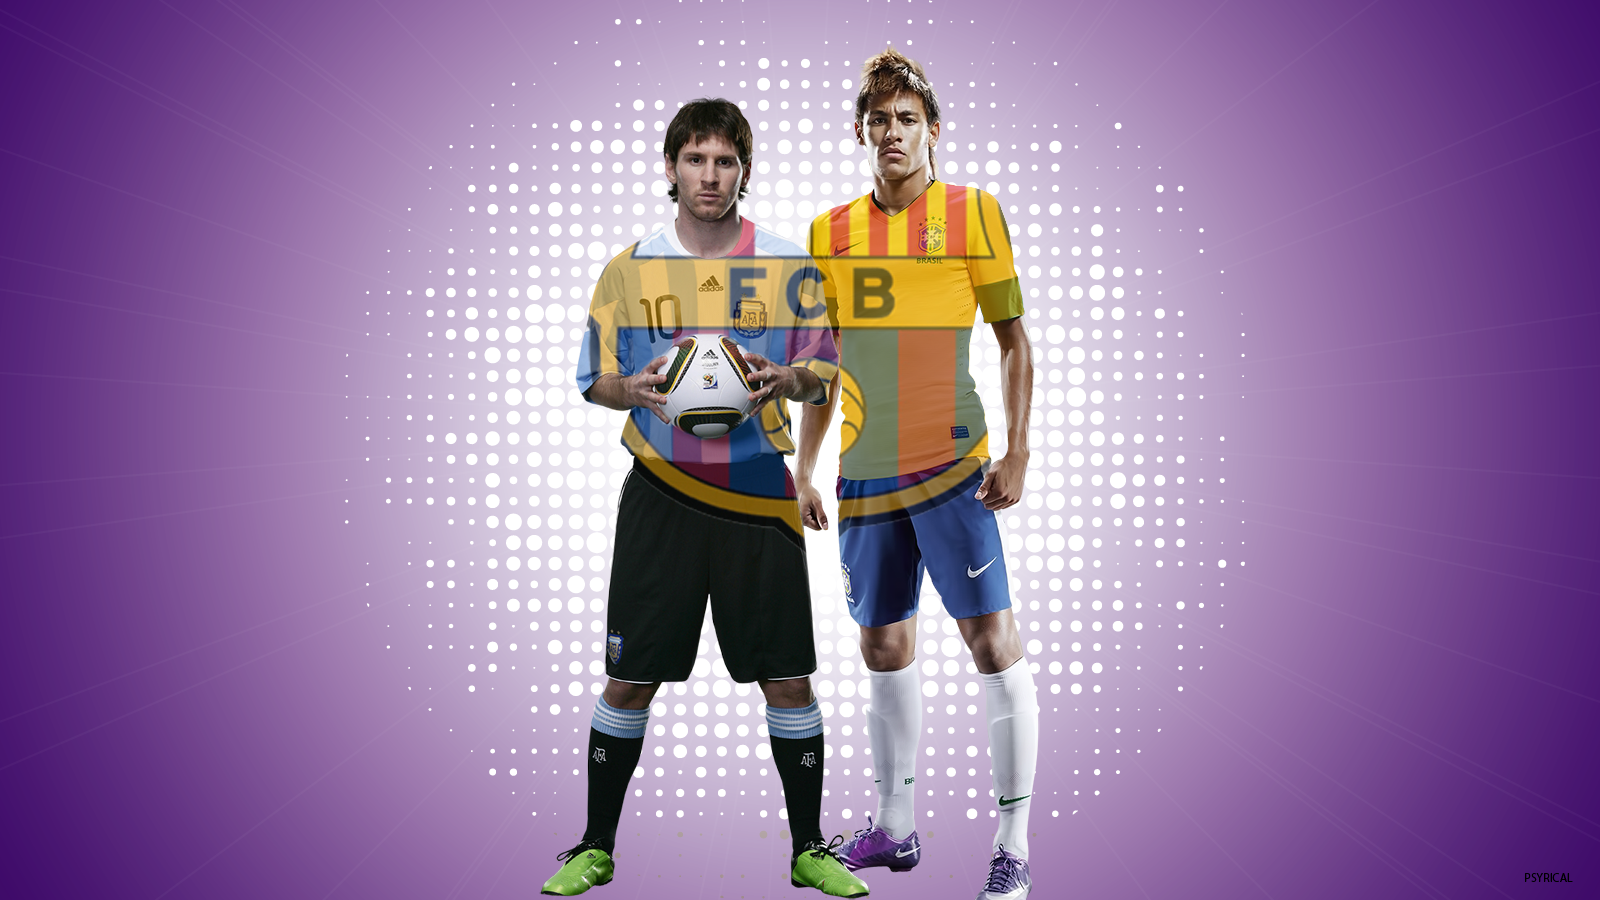 Neymar barcelona 2013 wallpaper for desktop lionel messi neymar barcelona 2013 wallpaper for desktop voltagebd Choice Image